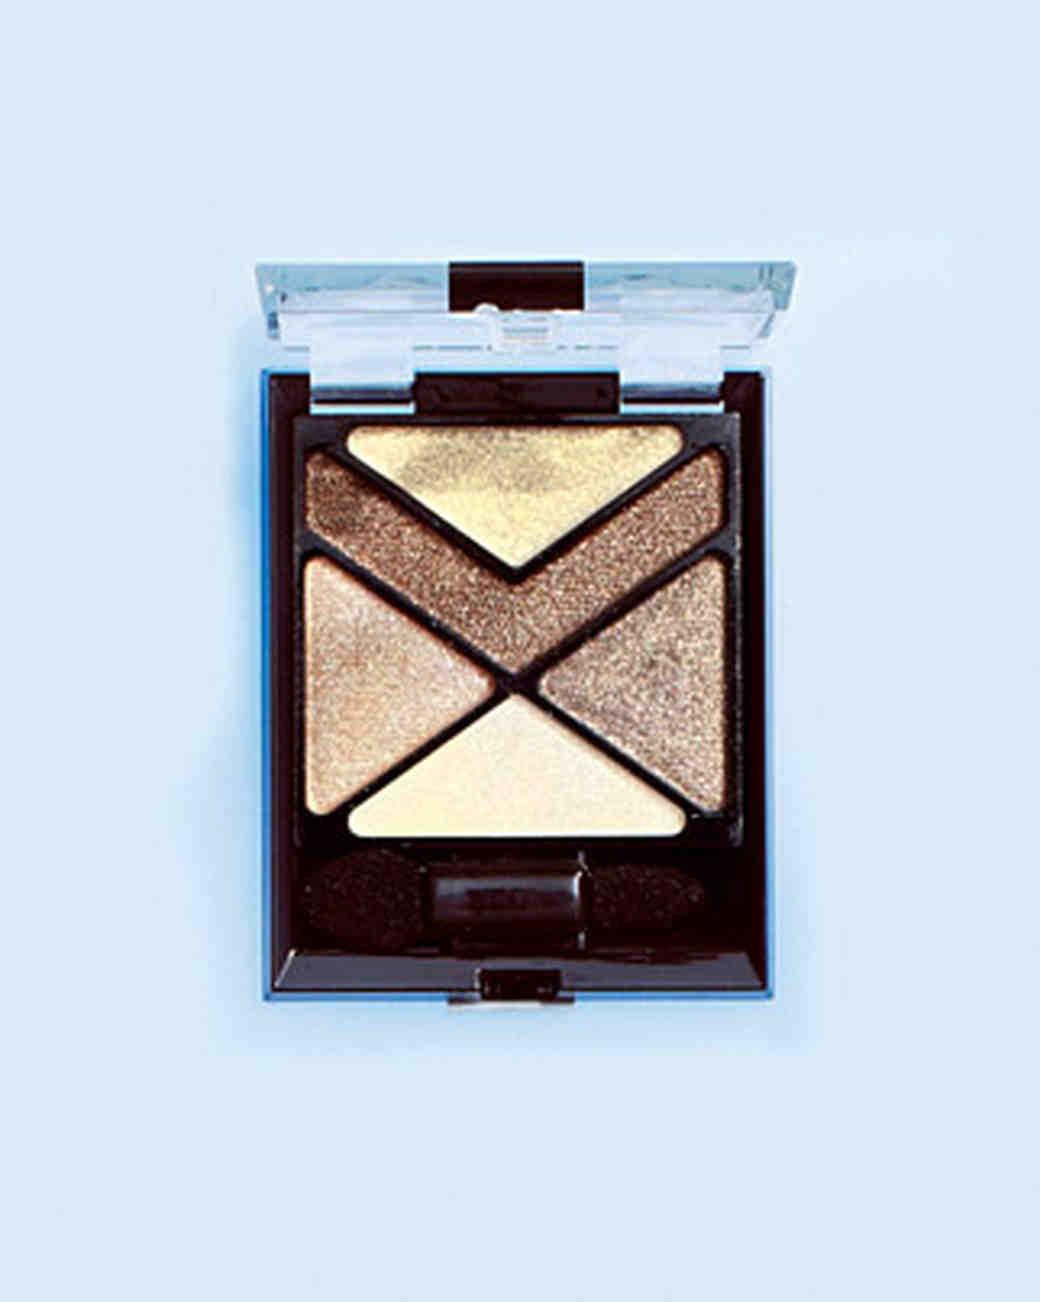 eyeshadow-in-caffeine-cosmetic-mwd107916.jpg